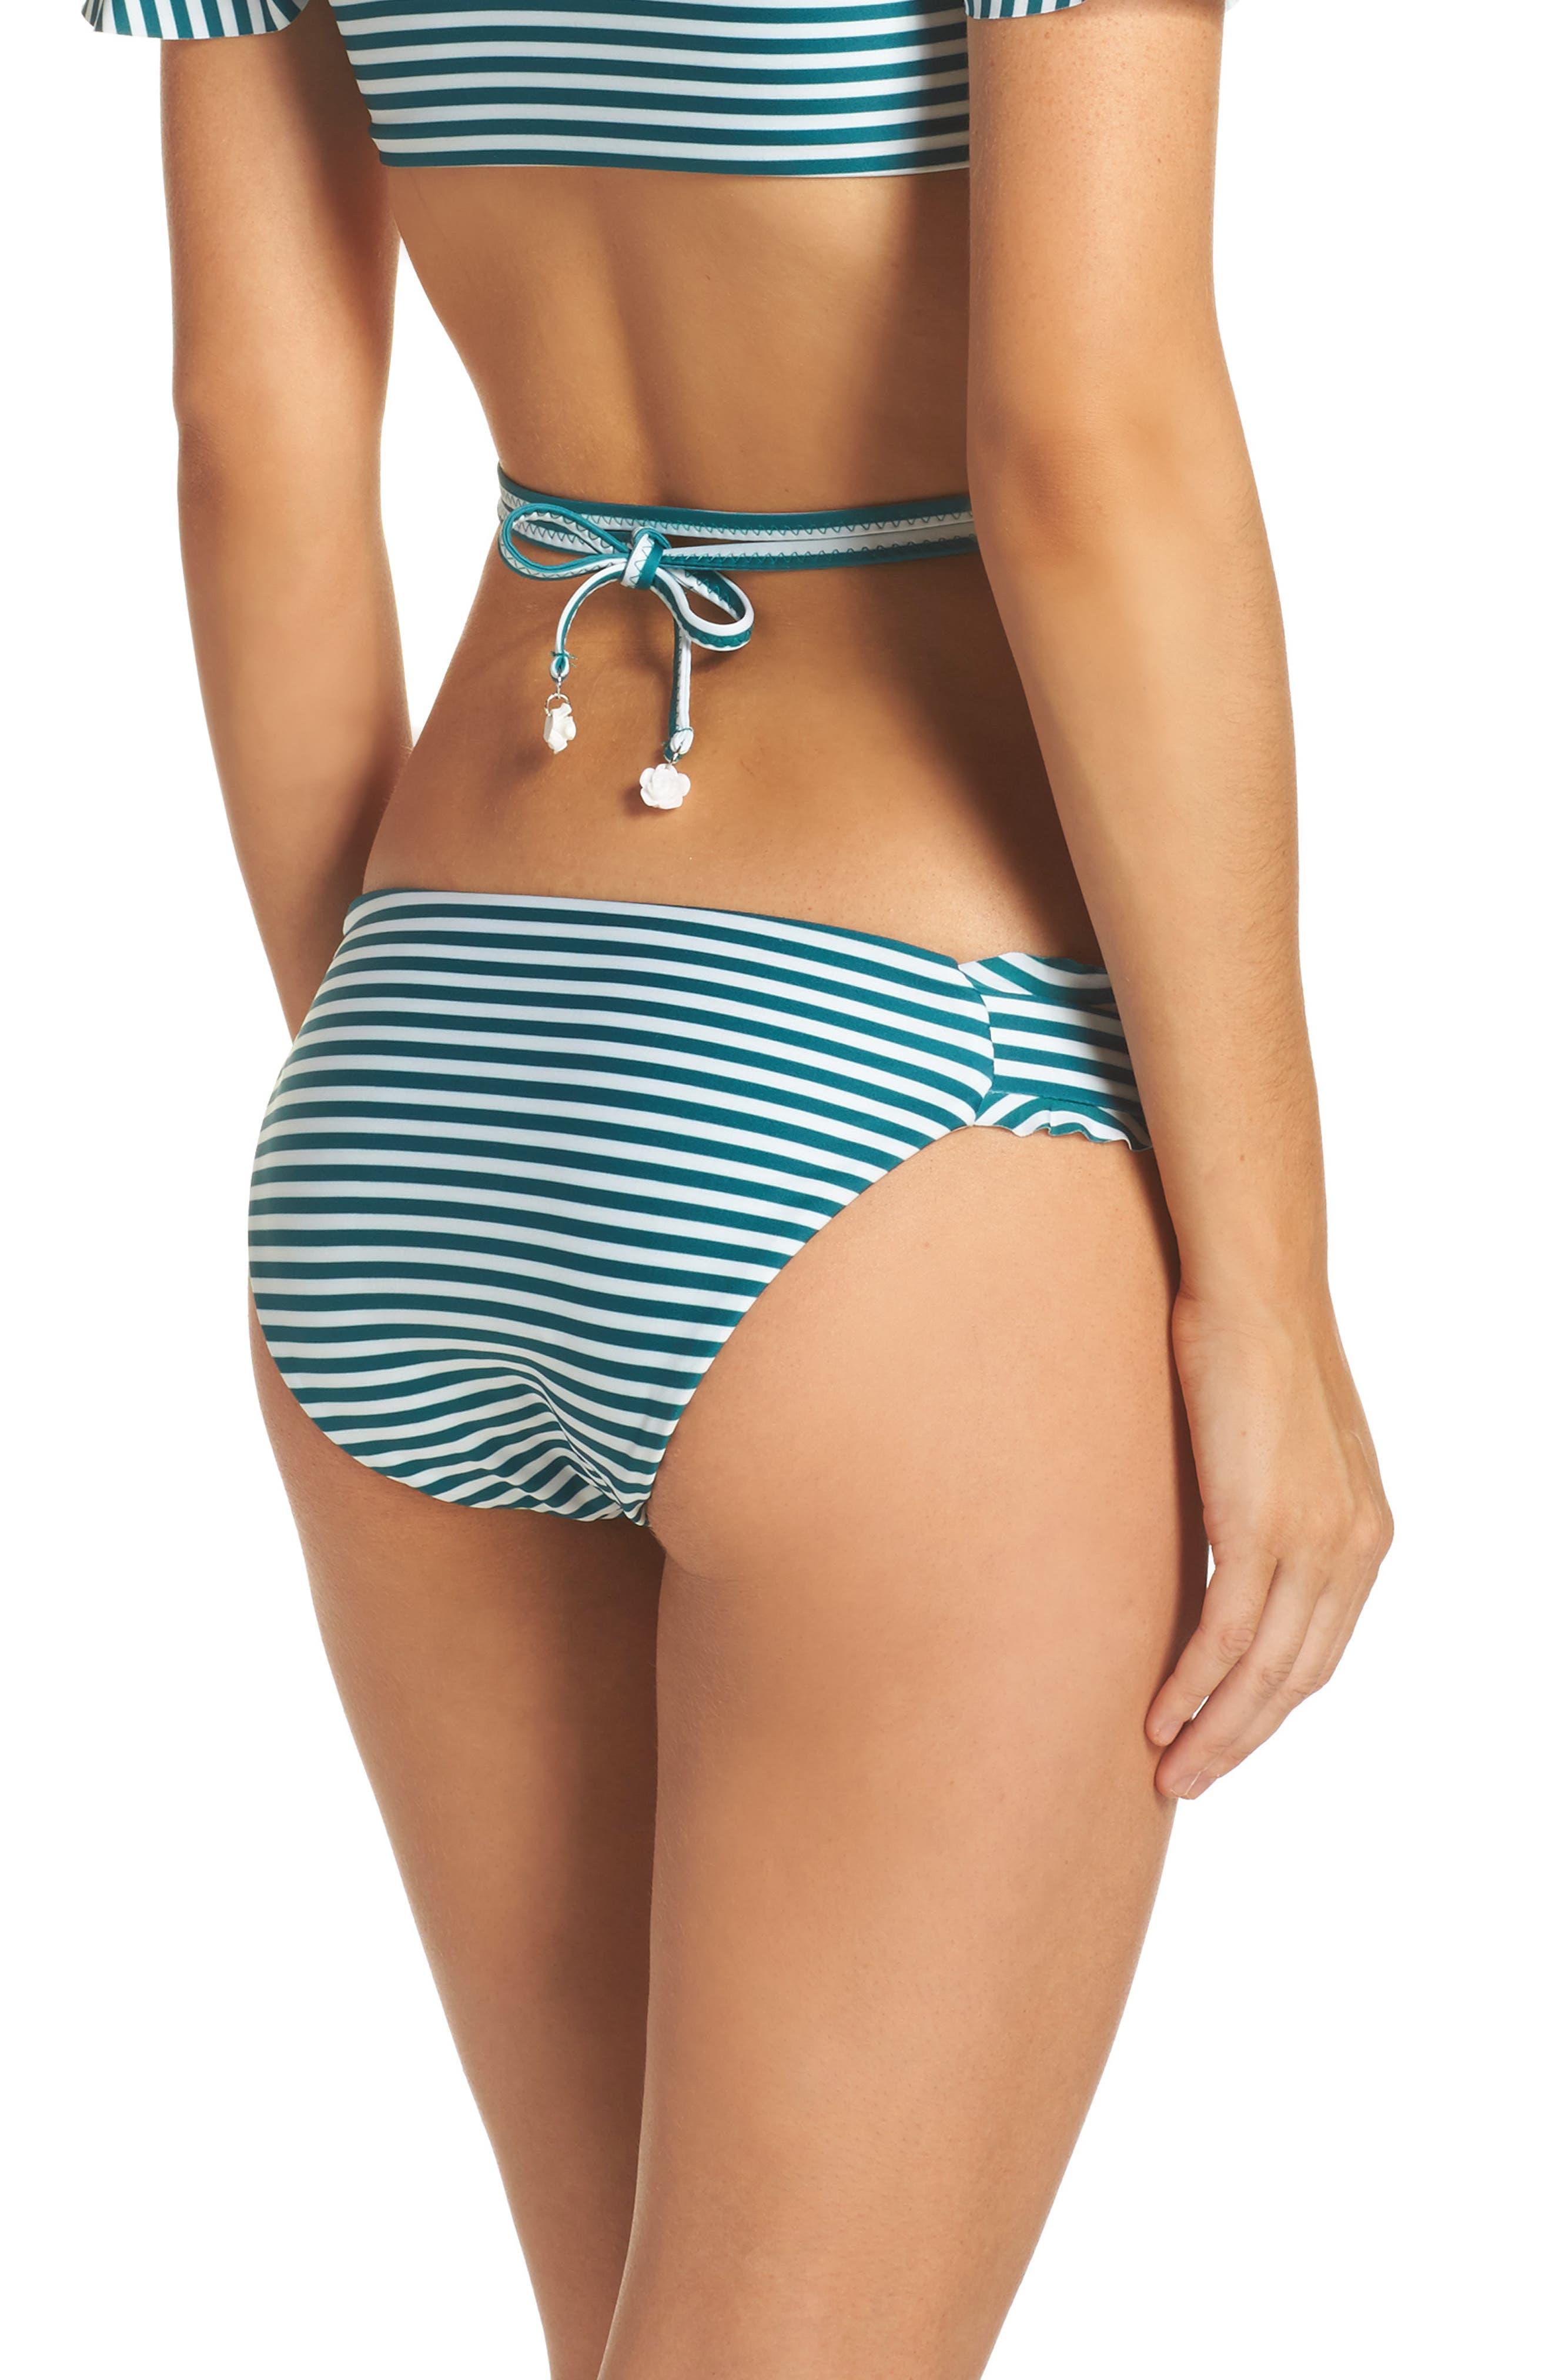 Avalon Ruffle Bikini Bottoms,                             Alternate thumbnail 2, color,                             001